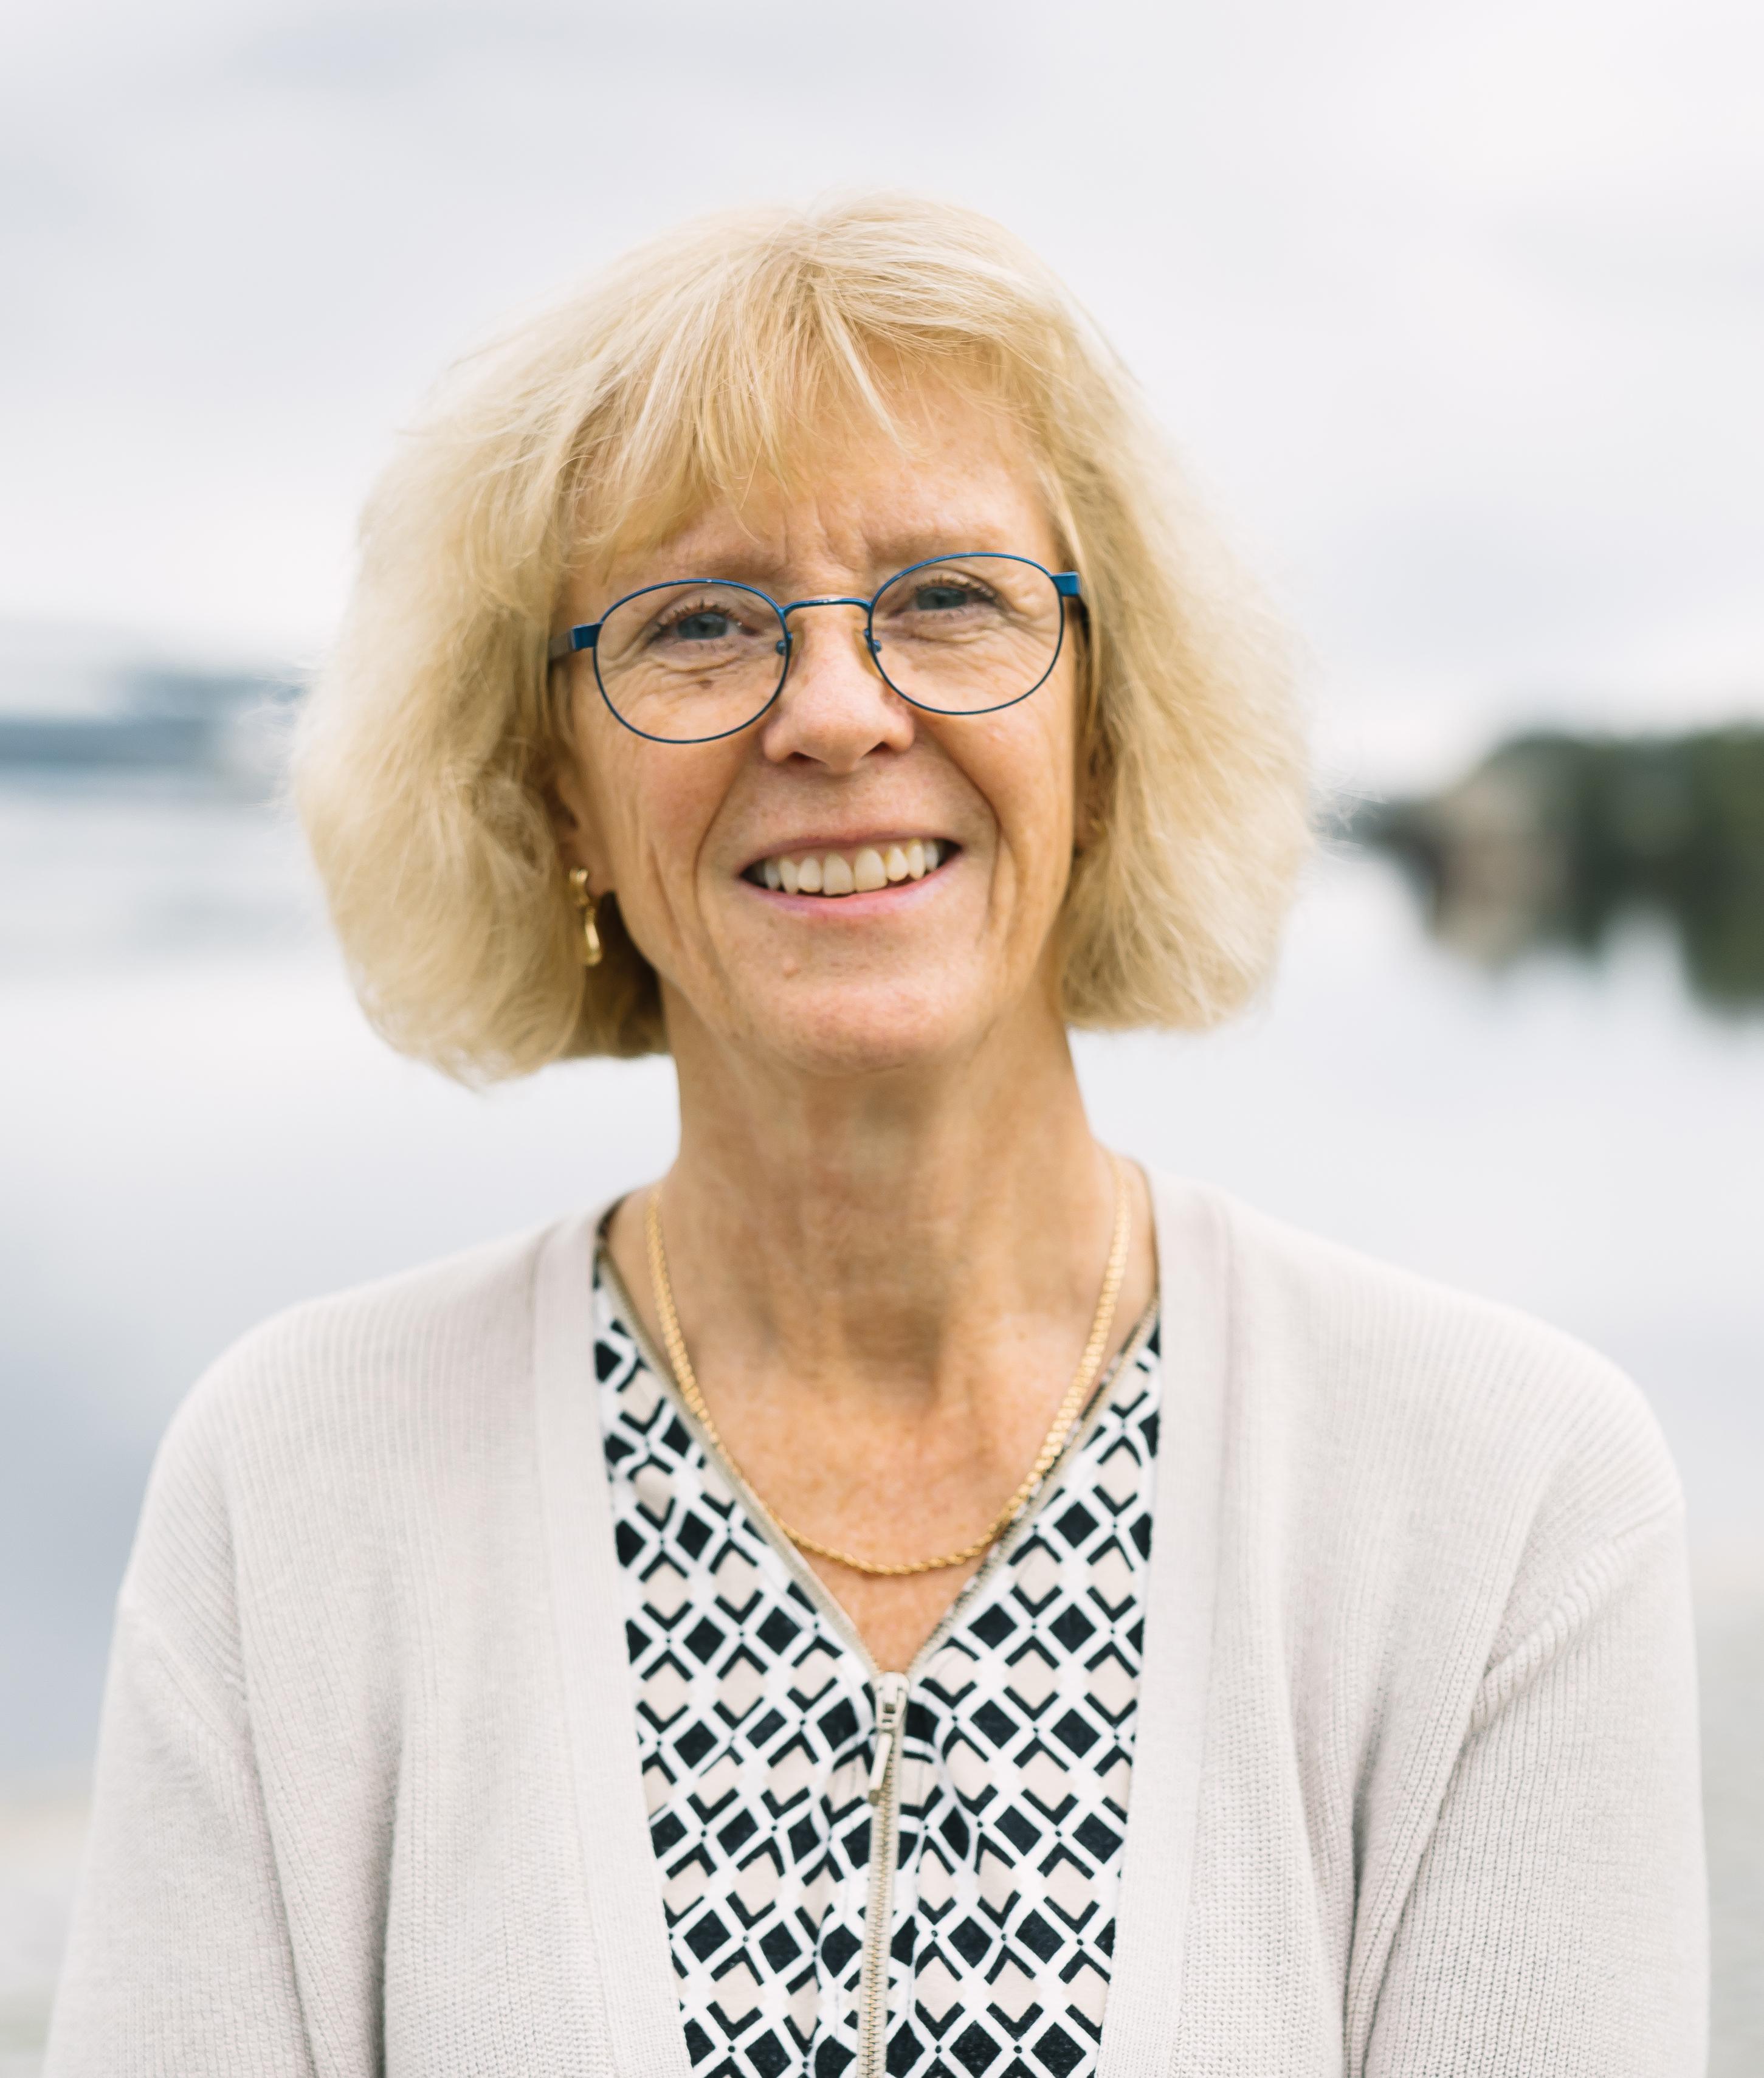 Ingrid Åsander